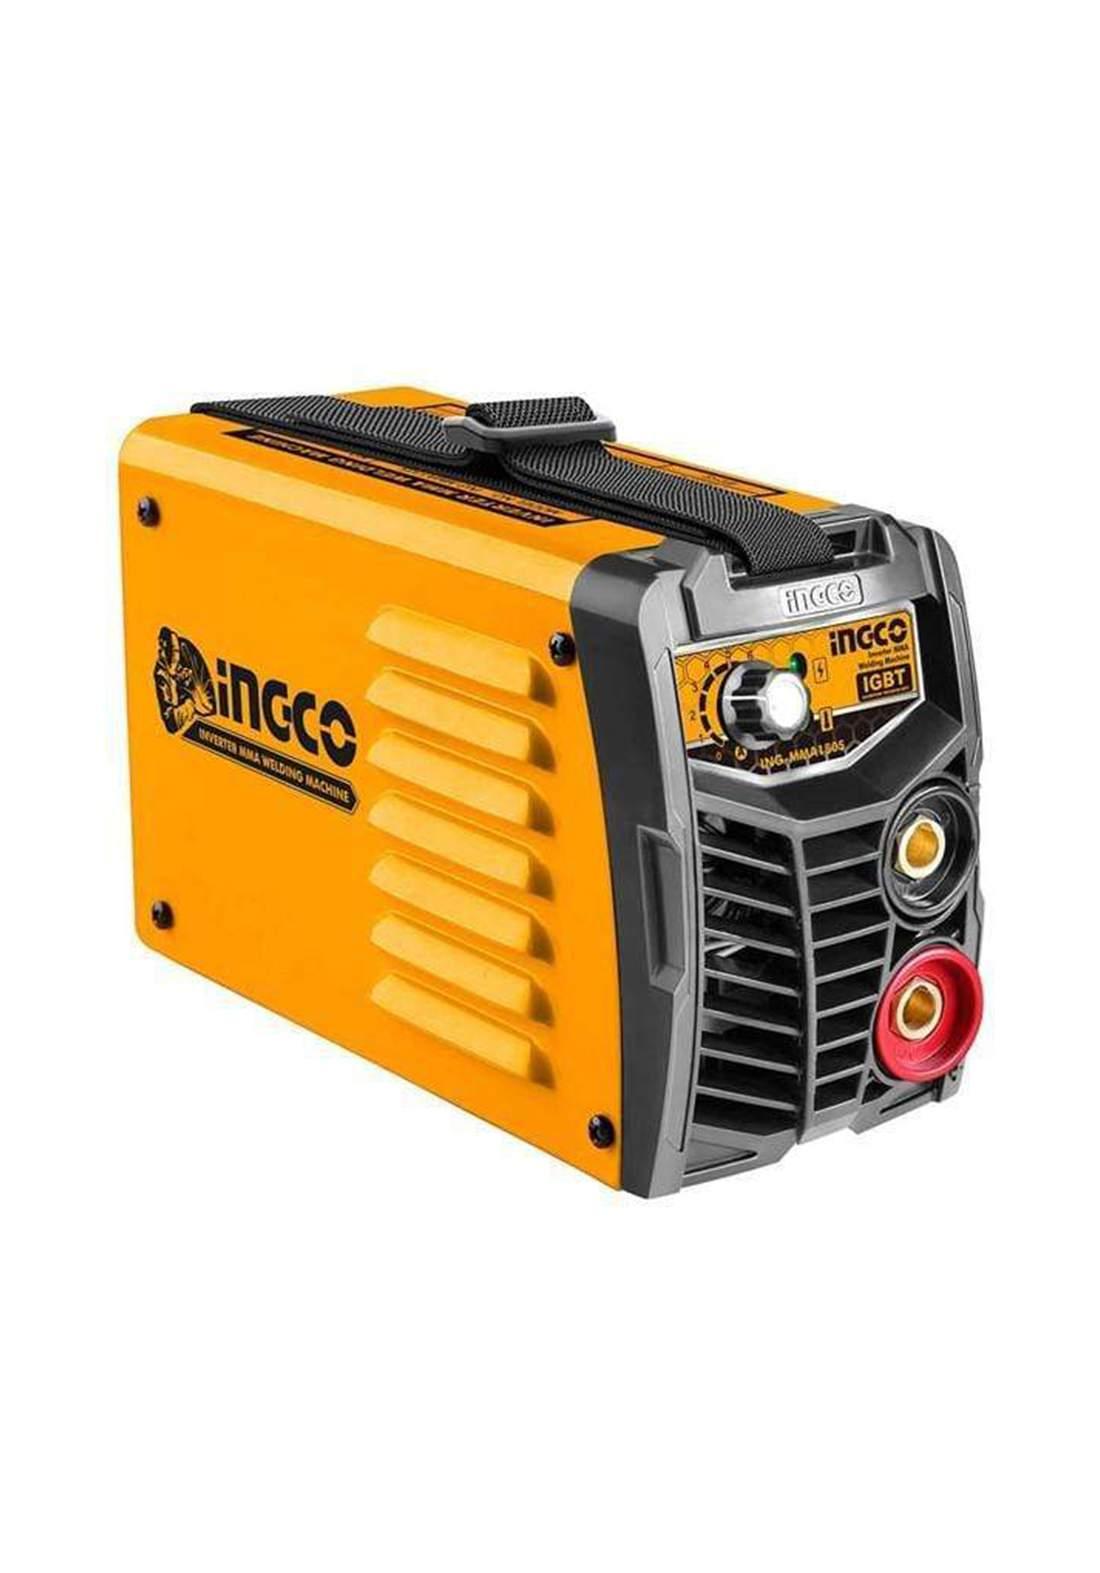 Ingco  ING-MMA16015 Inverter MMA Welding Machine 160 AMP  ماكنة لحام 160 امبير